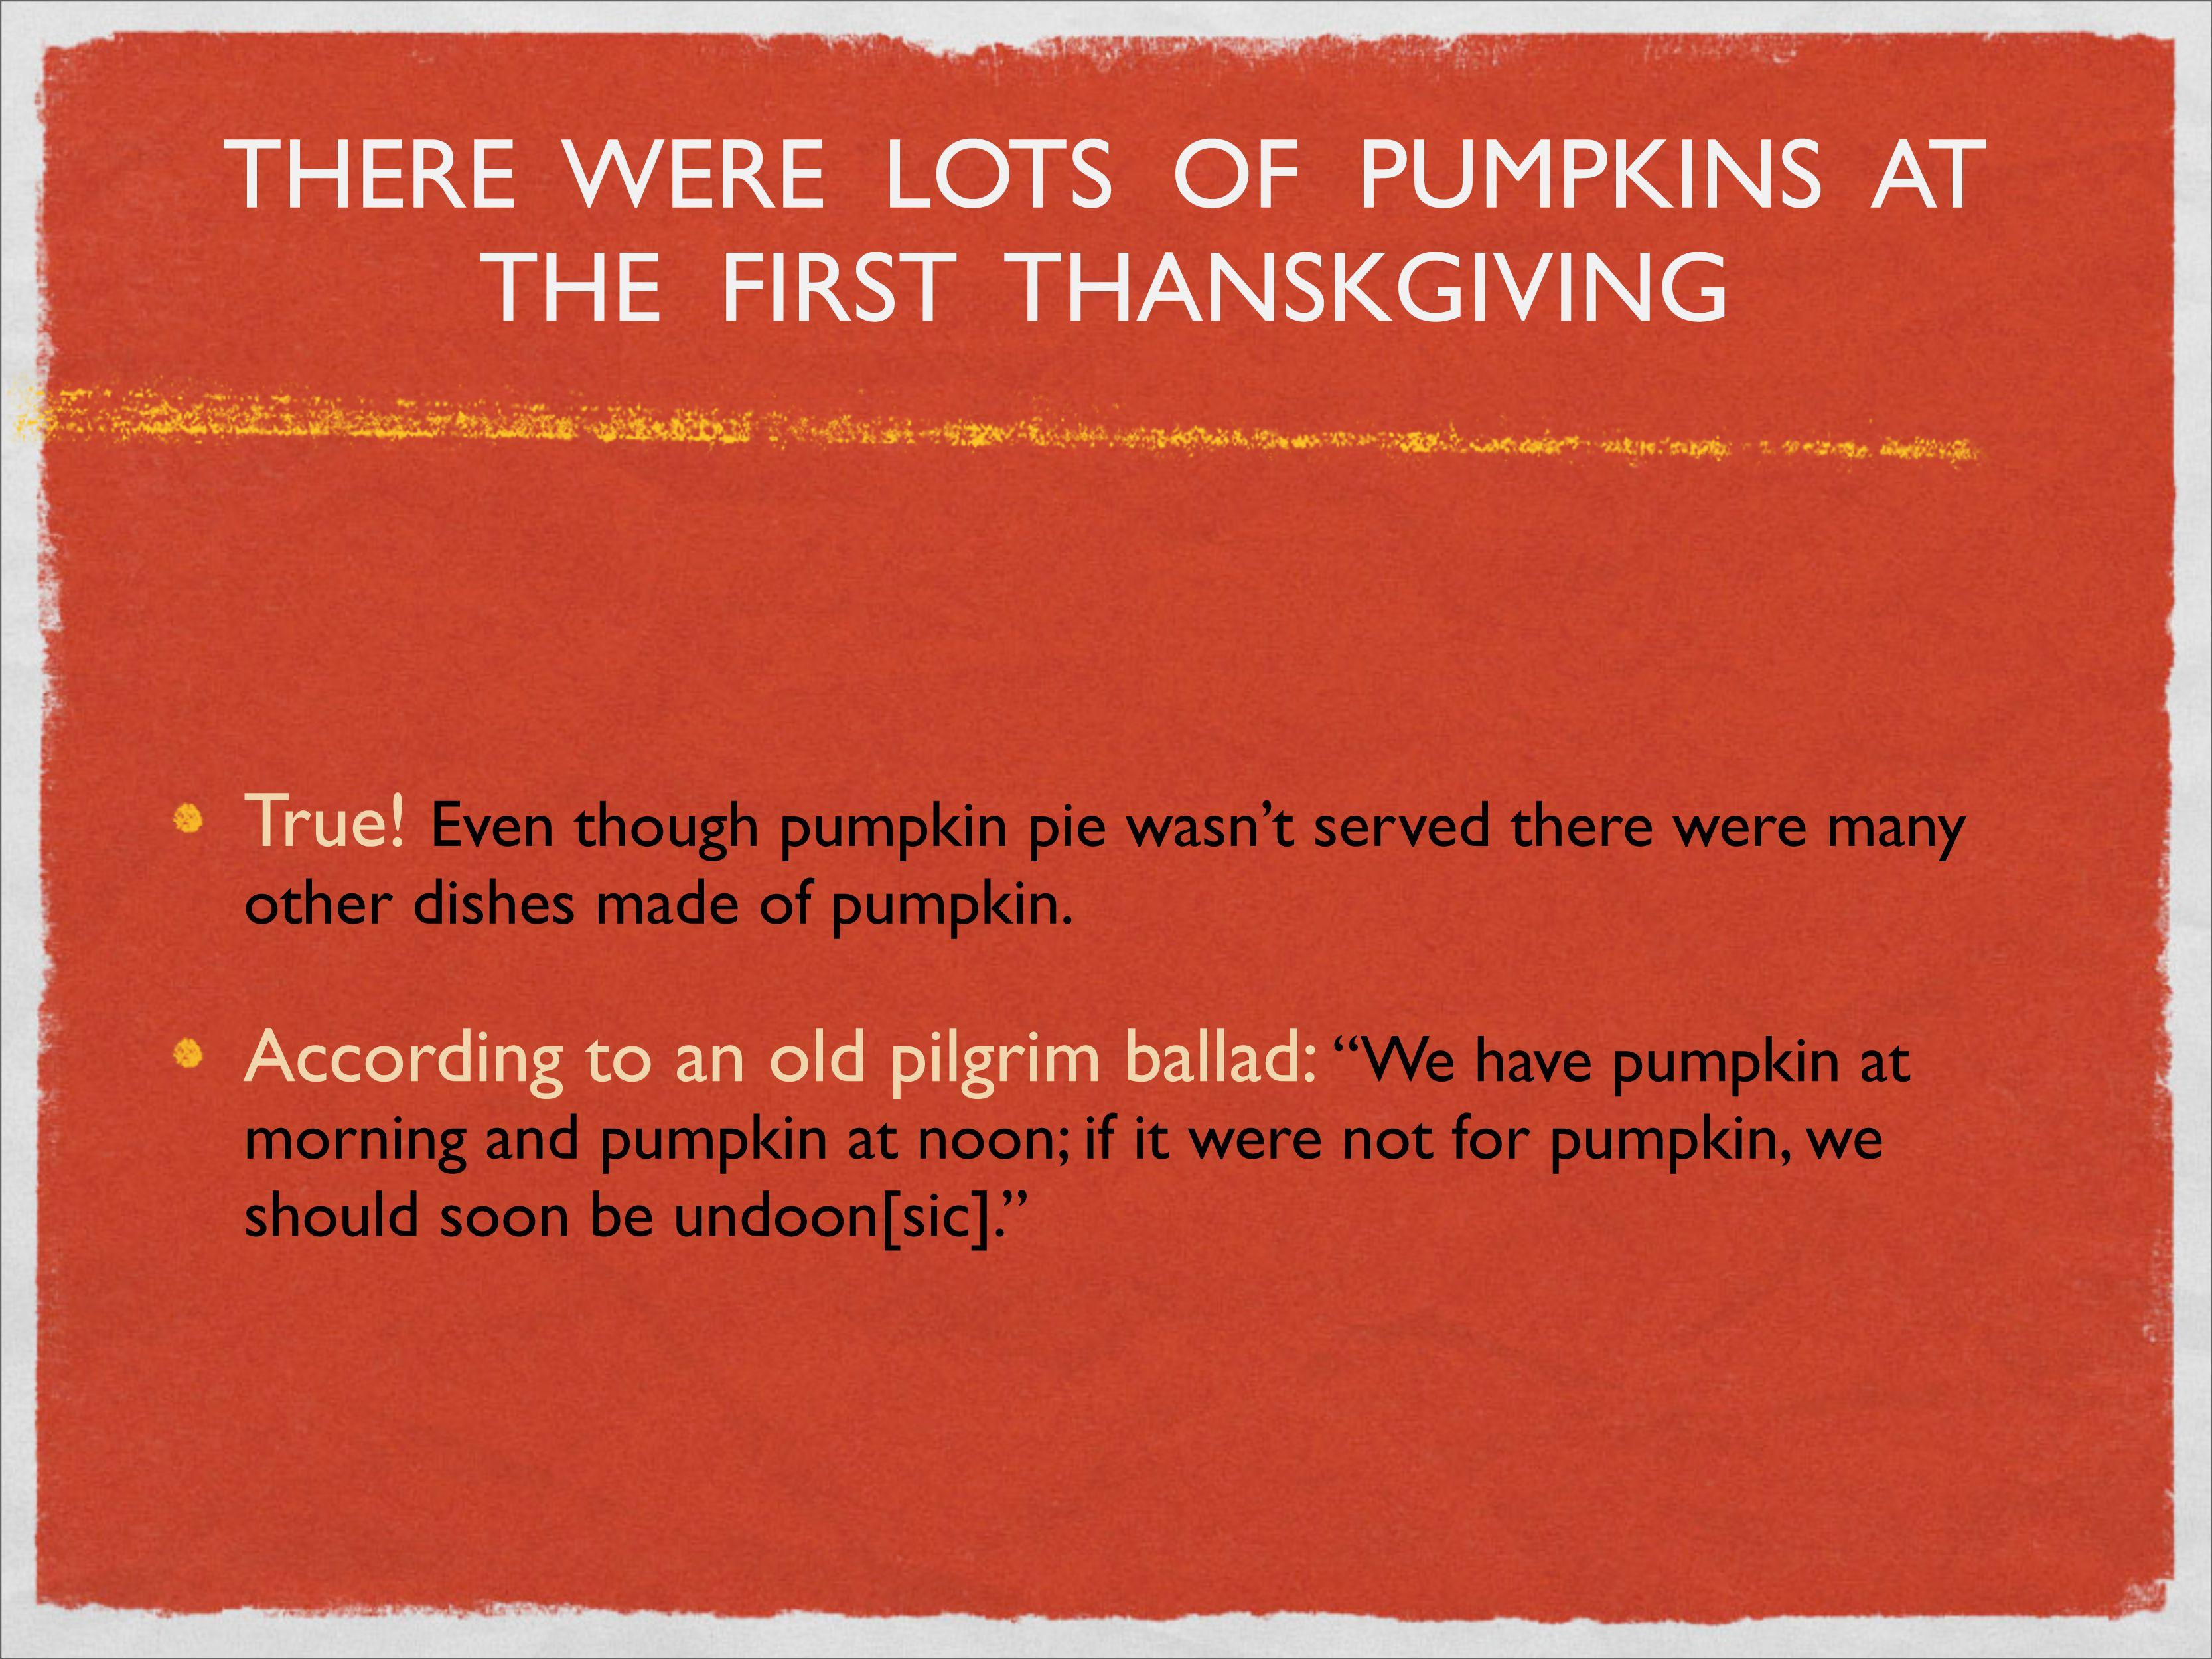 Pumpkins were served at the 'first' Thanksgiving... true